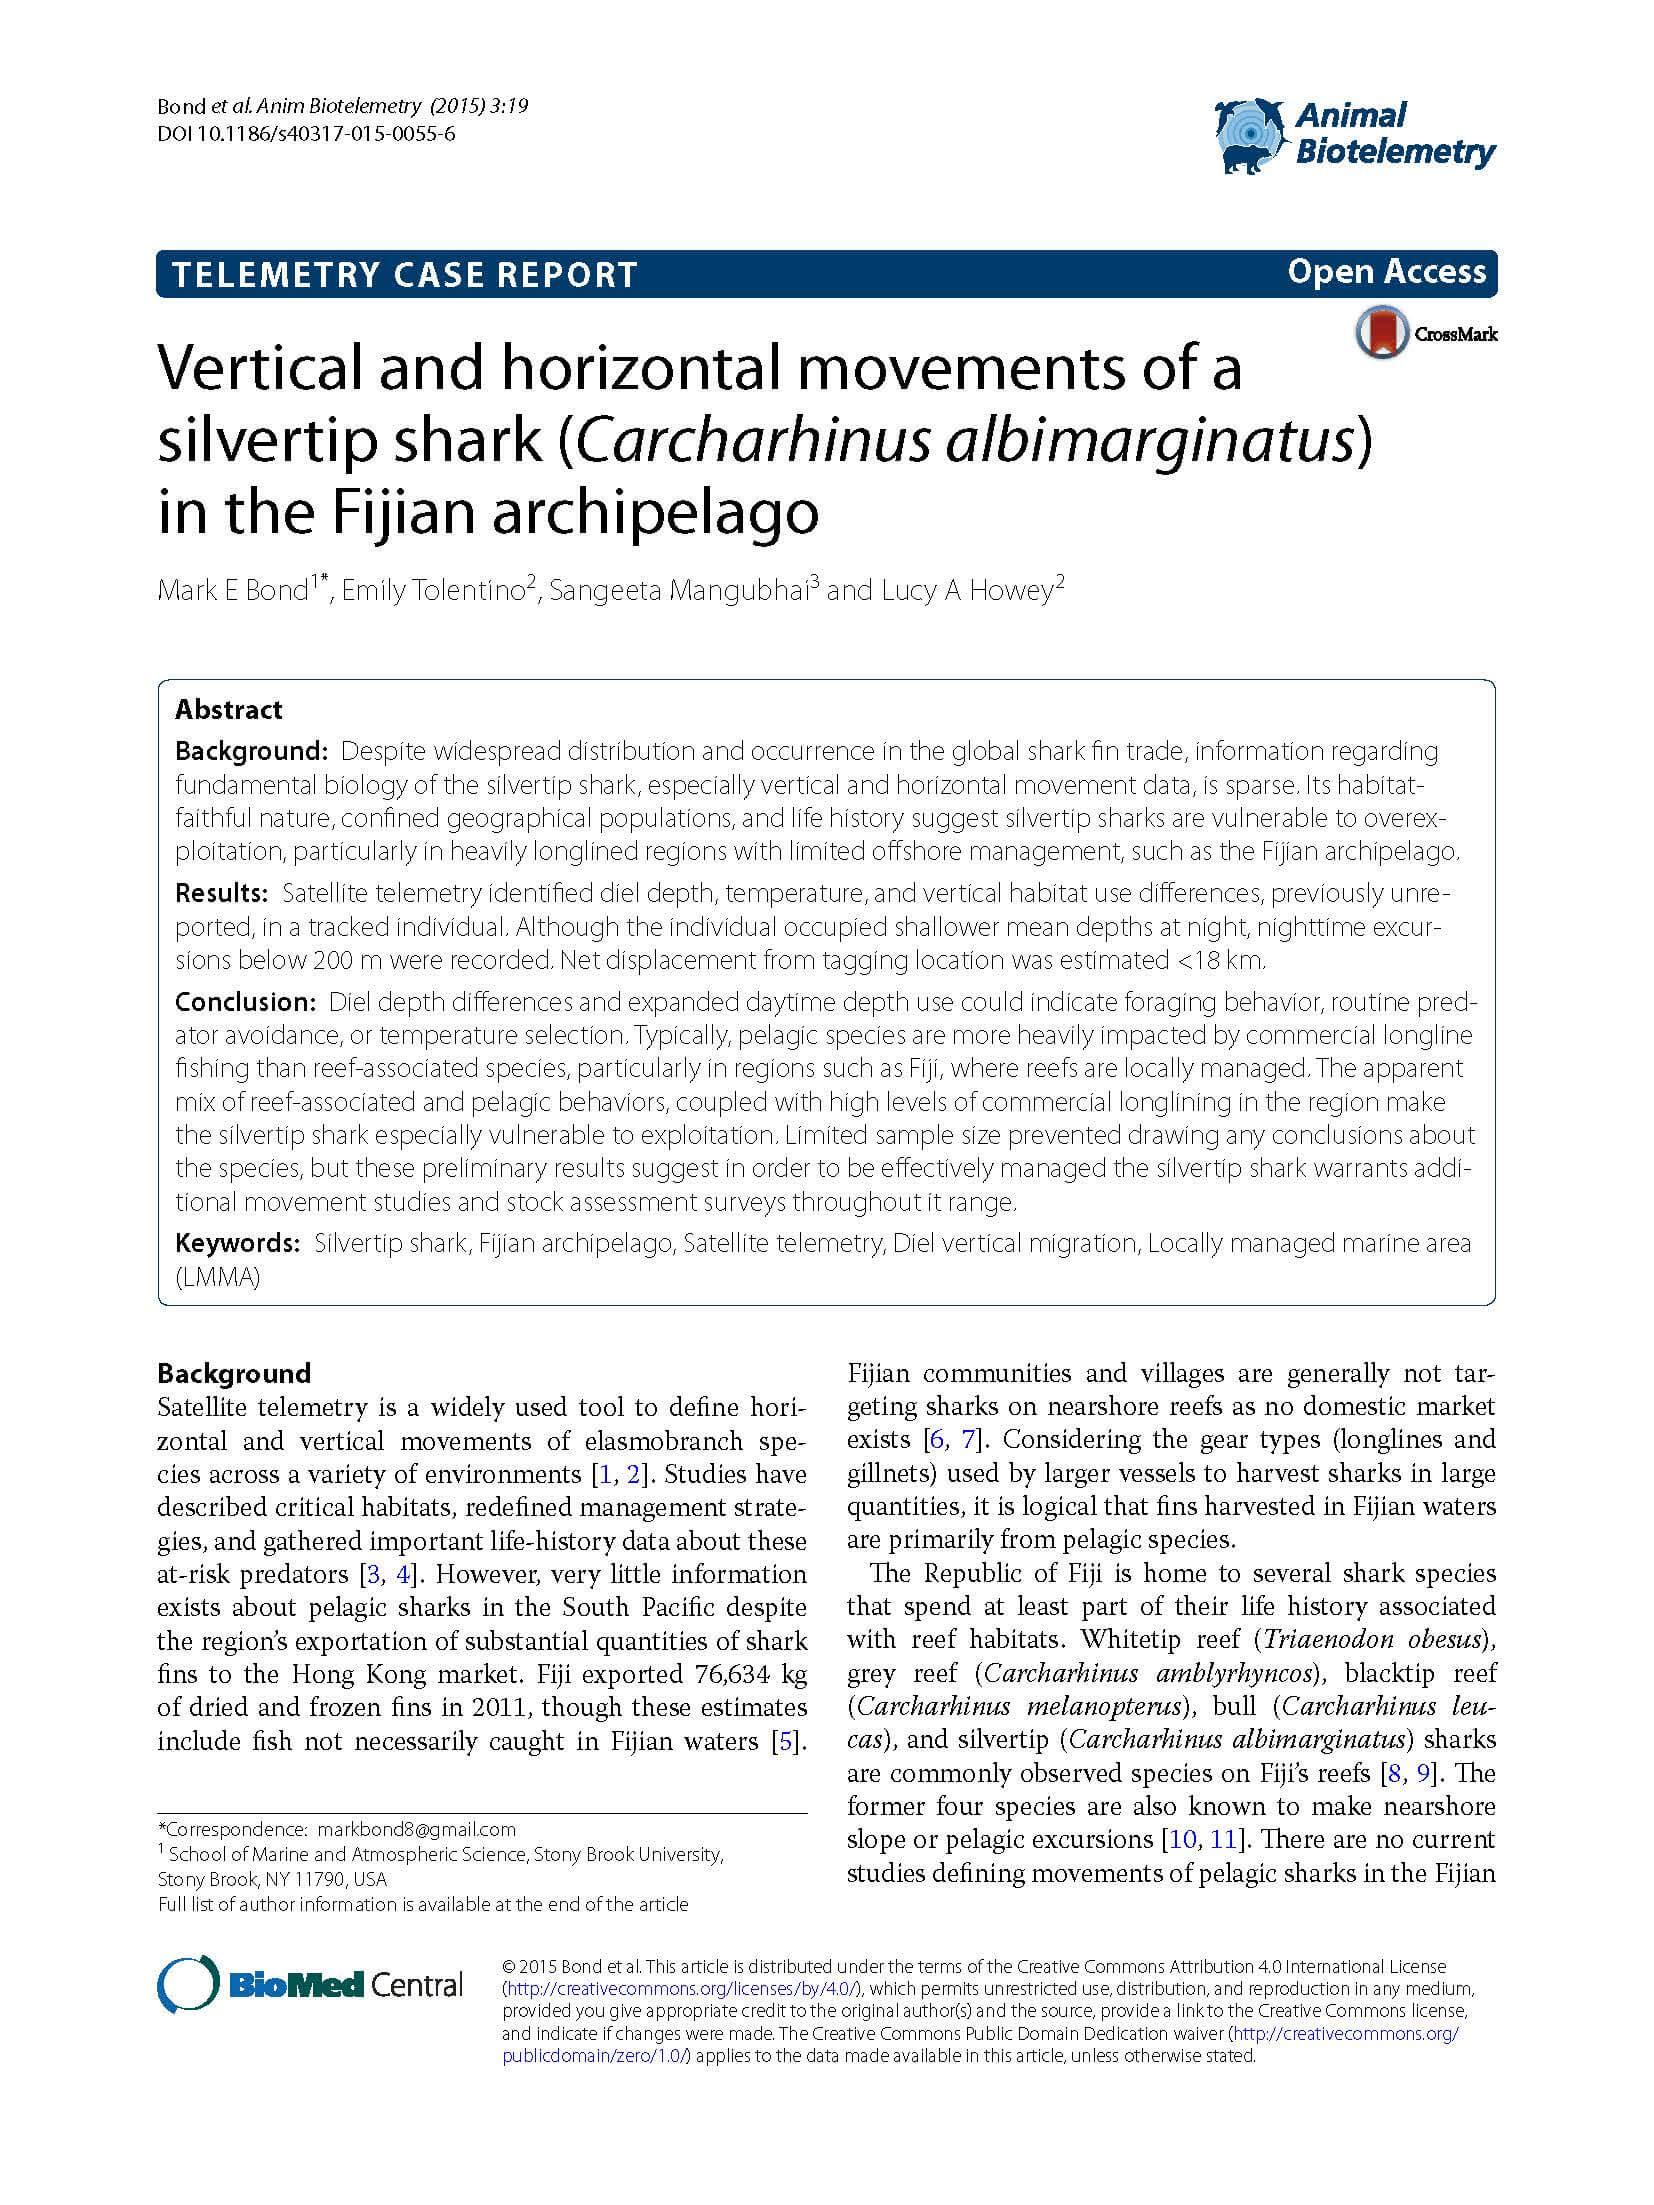 Vertical and Horizontal Movements of a Silvertip Shark (Carcharhinus Albimarginatus) in the Fijian Archipelago